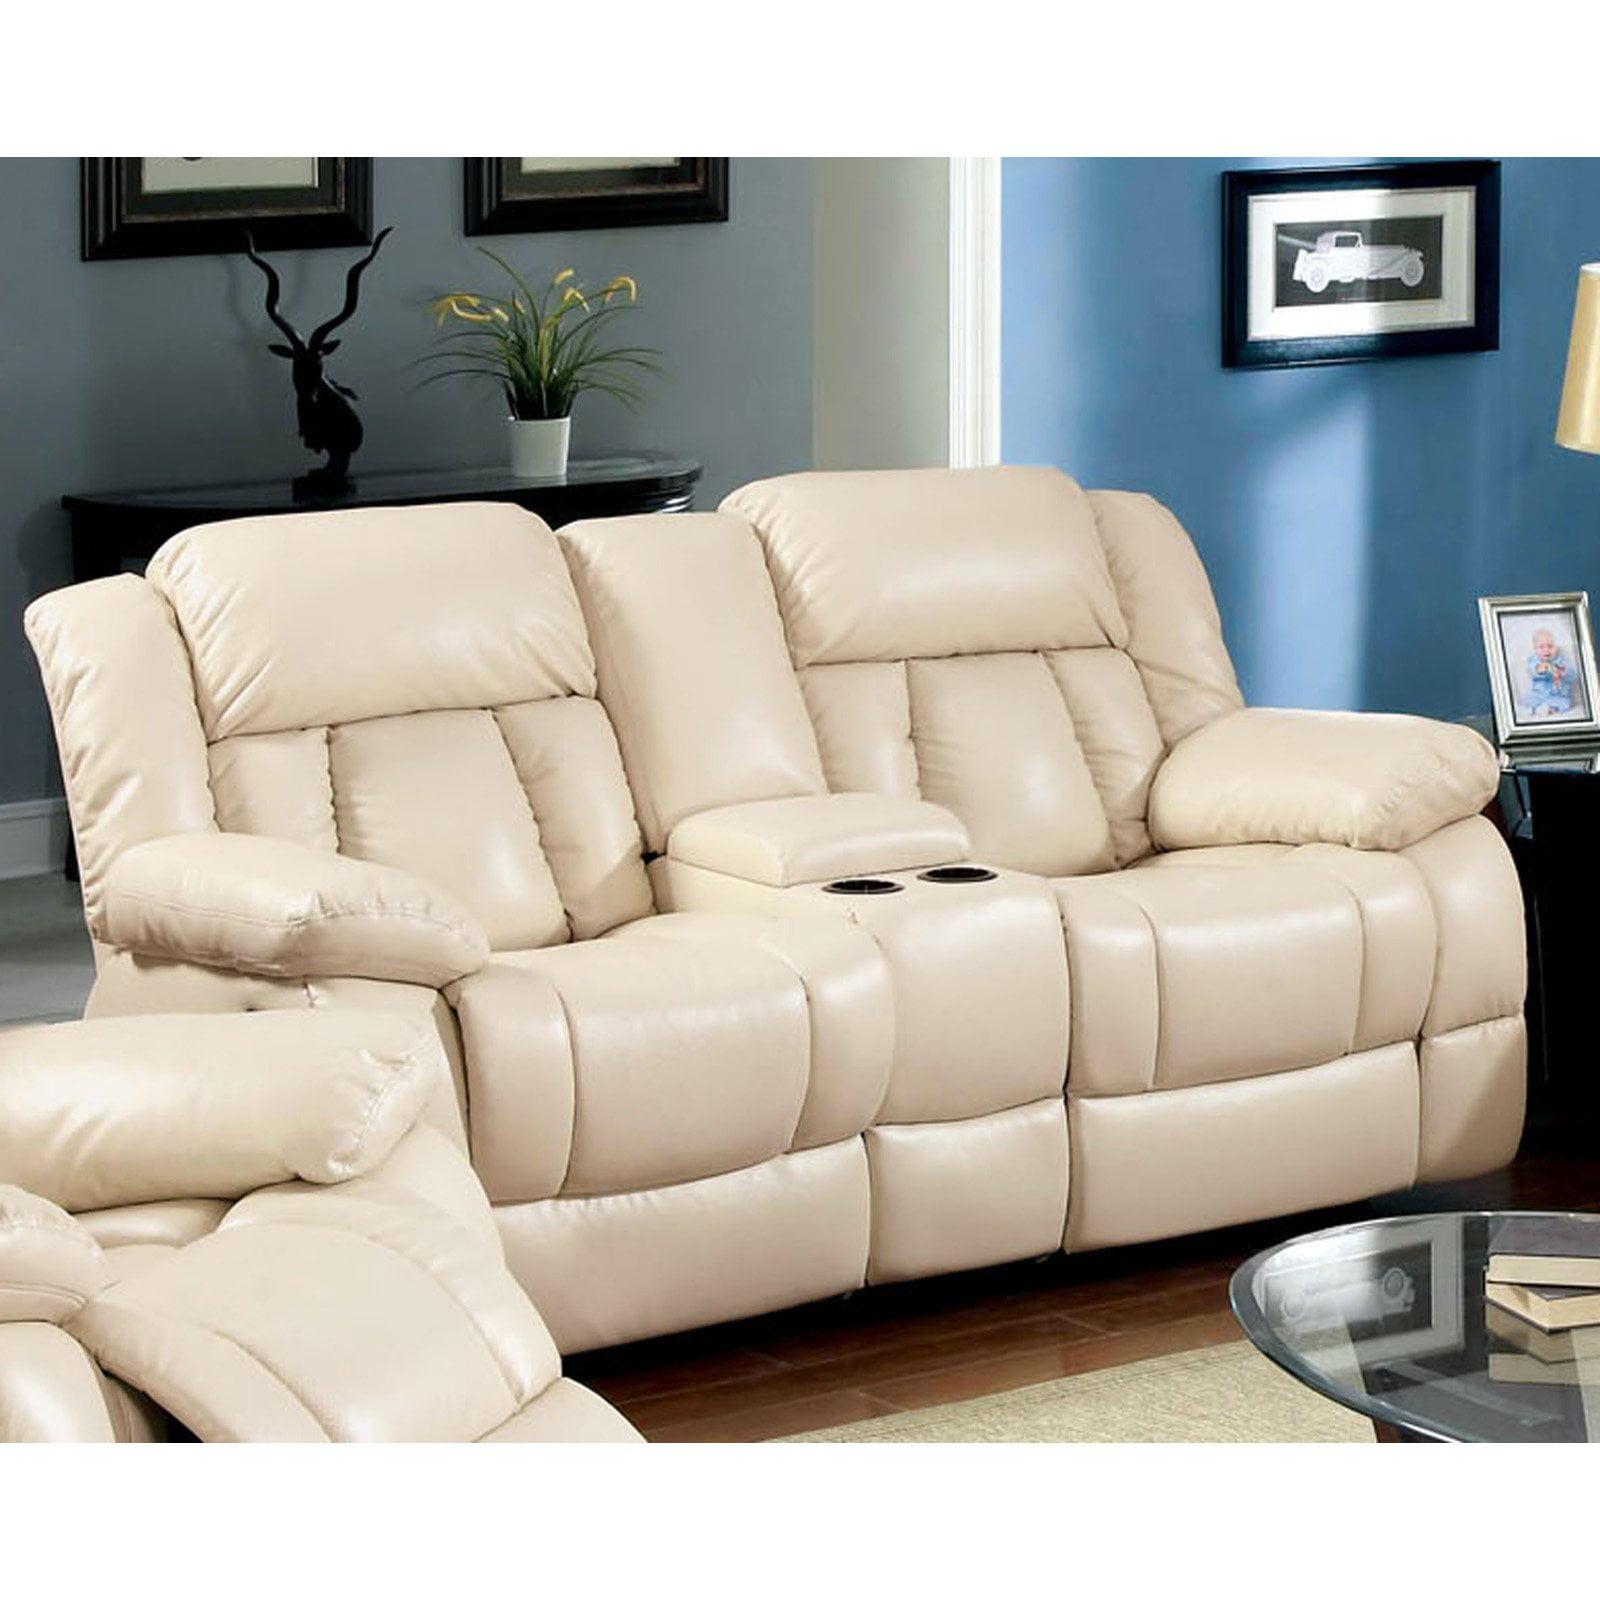 Furniture of America Rawene Bonded Leather Loveseat Recliner